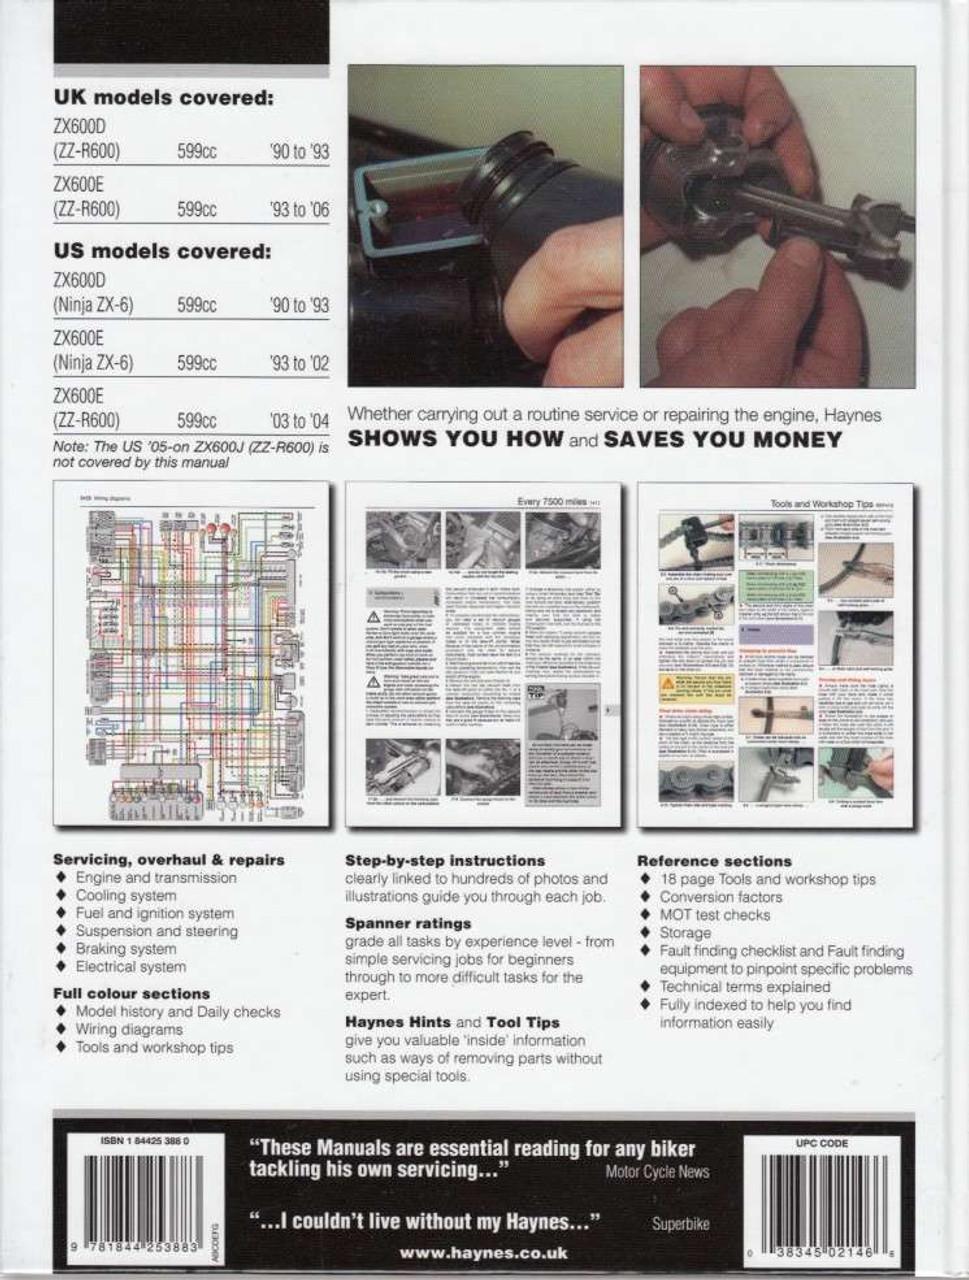 Outstanding Kawasaki Zx600 Zz R600 Ninja Zx 6 1990 2006 Workshop Manual Wiring 101 Cranwise Assnl